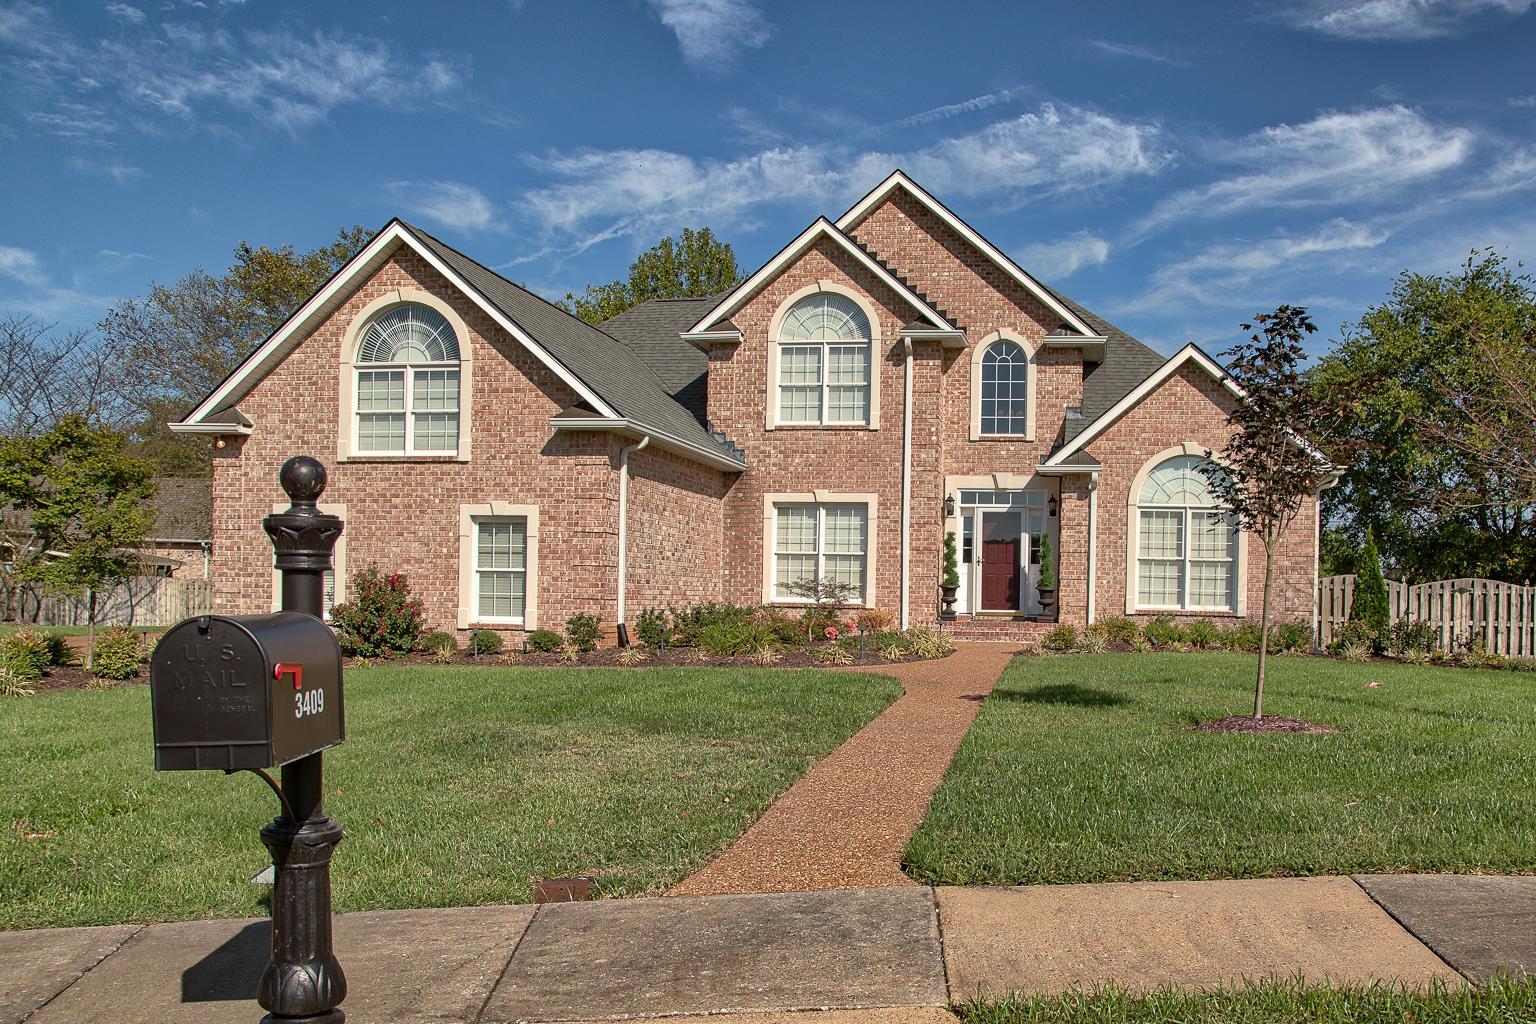 3409 Quail Chase Cv, Murfreesboro, TN 37129 - Murfreesboro, TN real estate listing